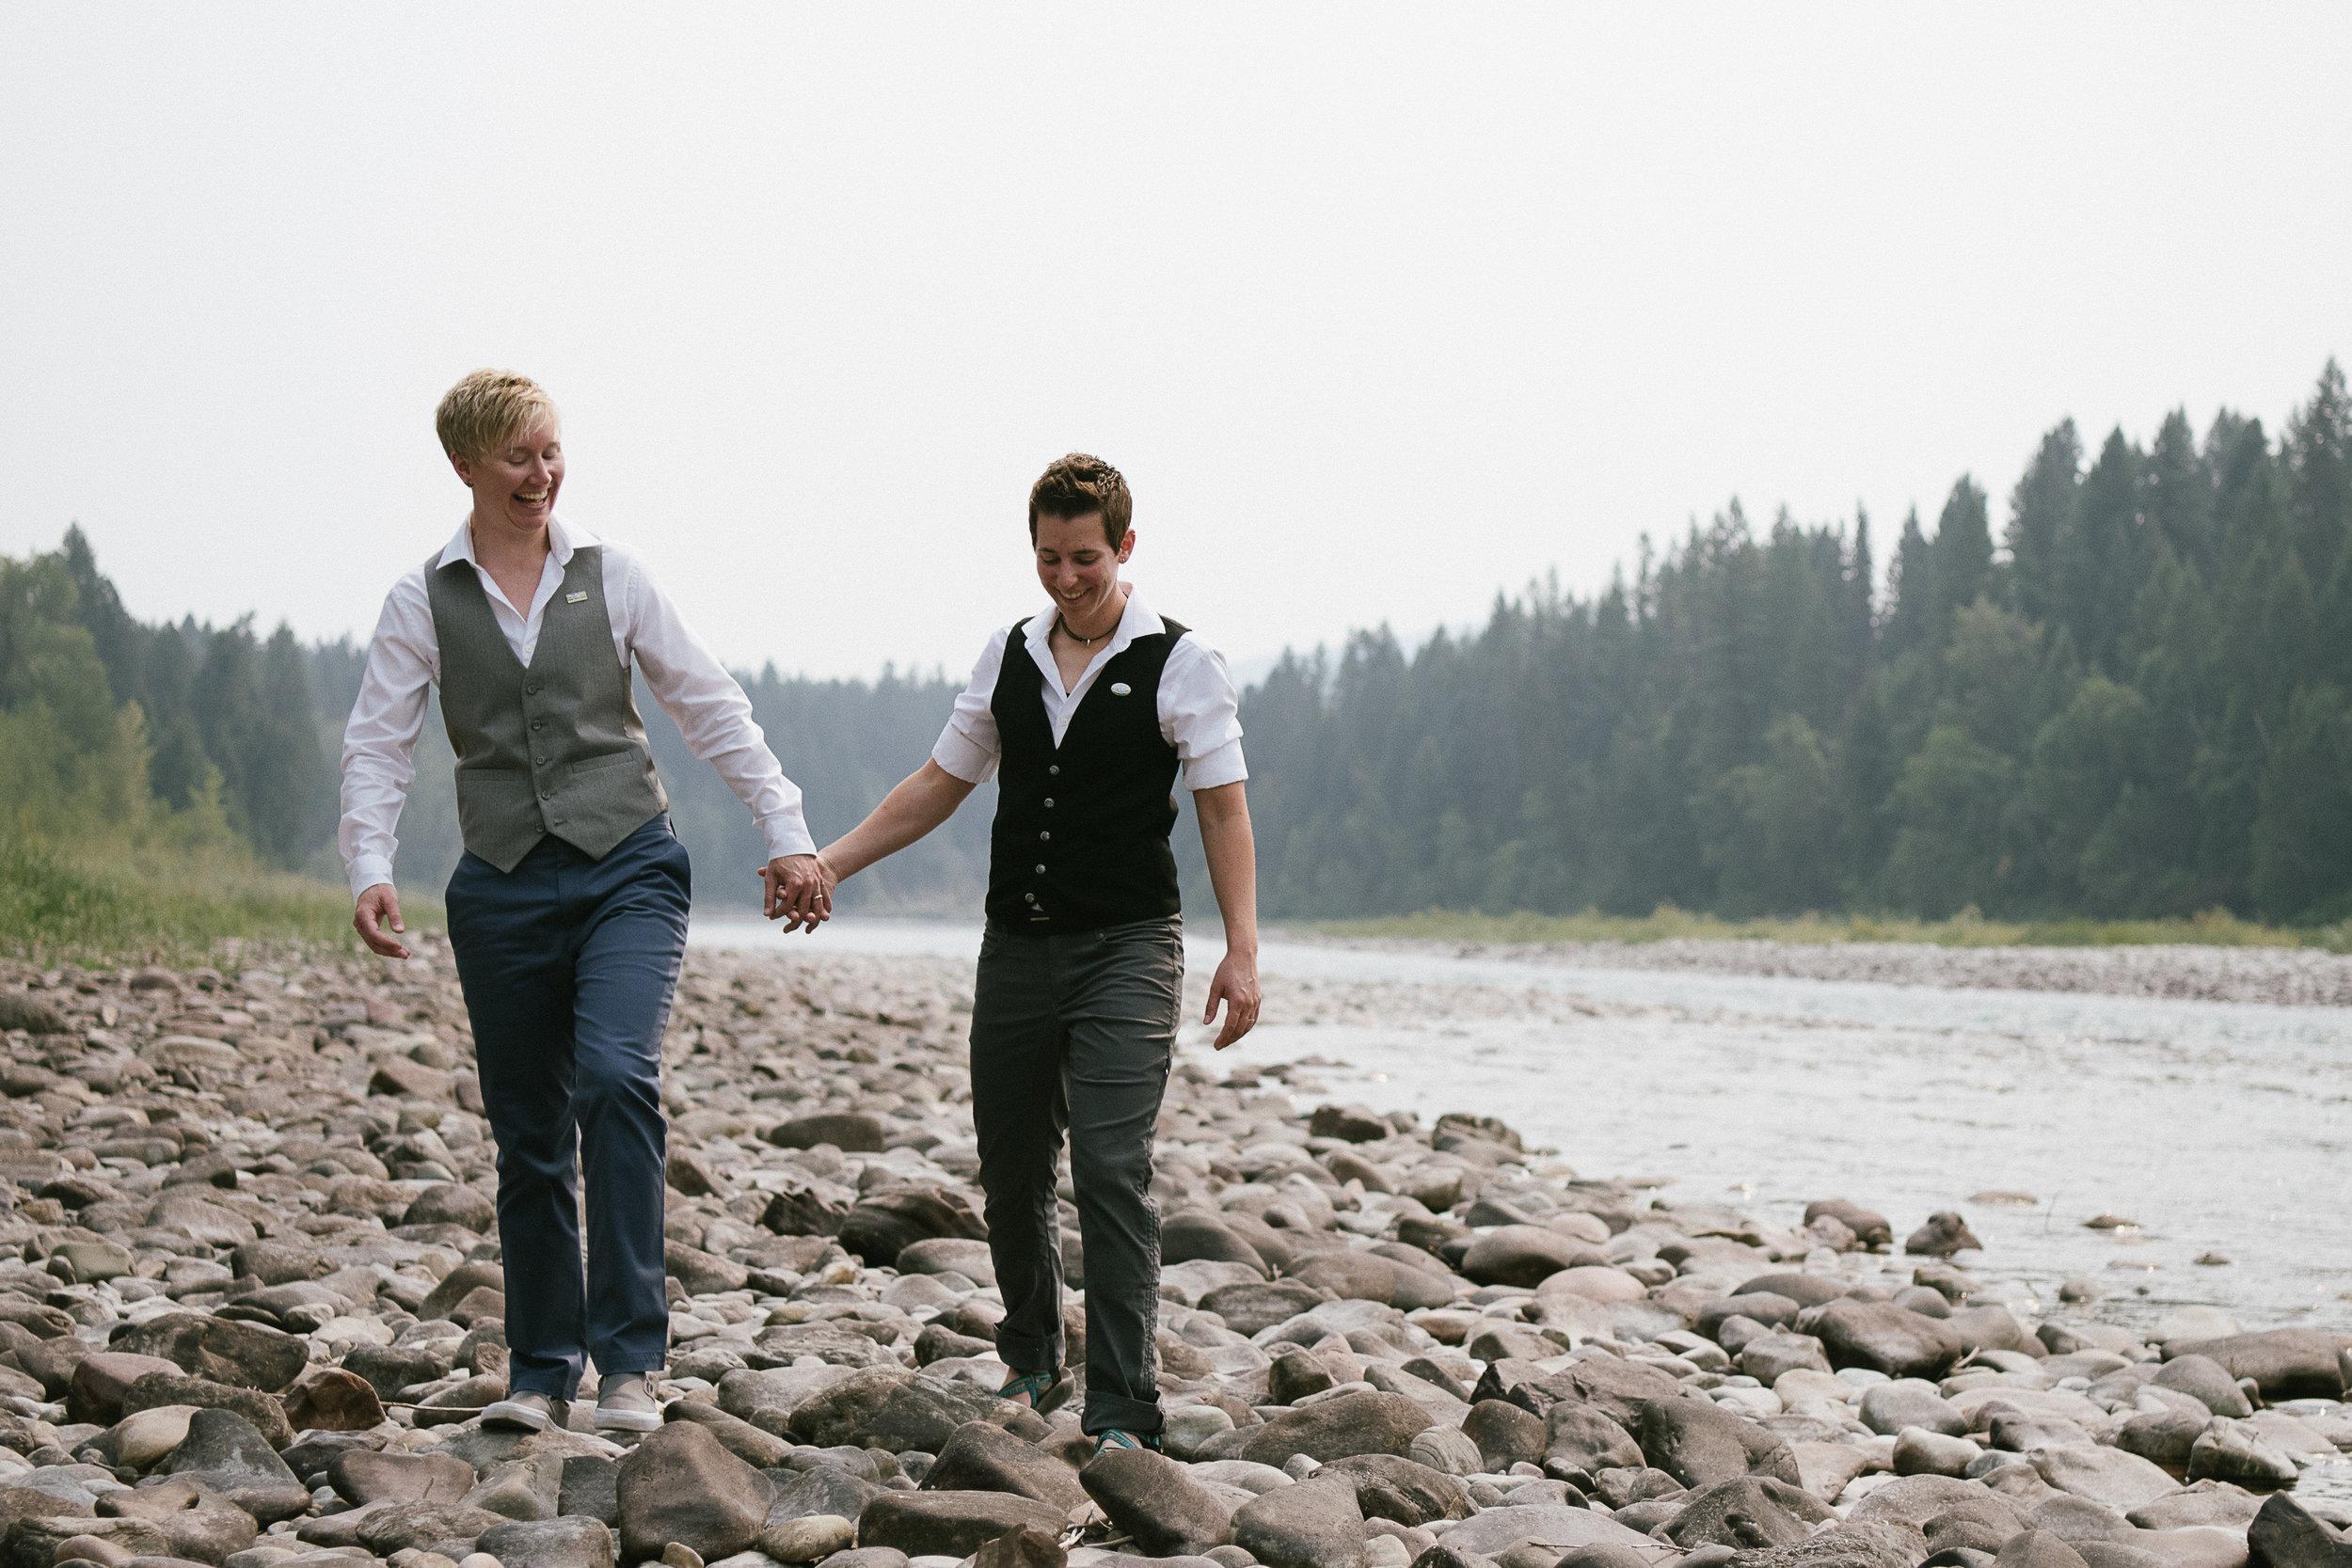 Glacier Montana Wedding_Elly Maurer + Frankie Dashiell Wedding_Beautiful Outdoor Wedding_Kelsey Lane Photography-5043.jpg